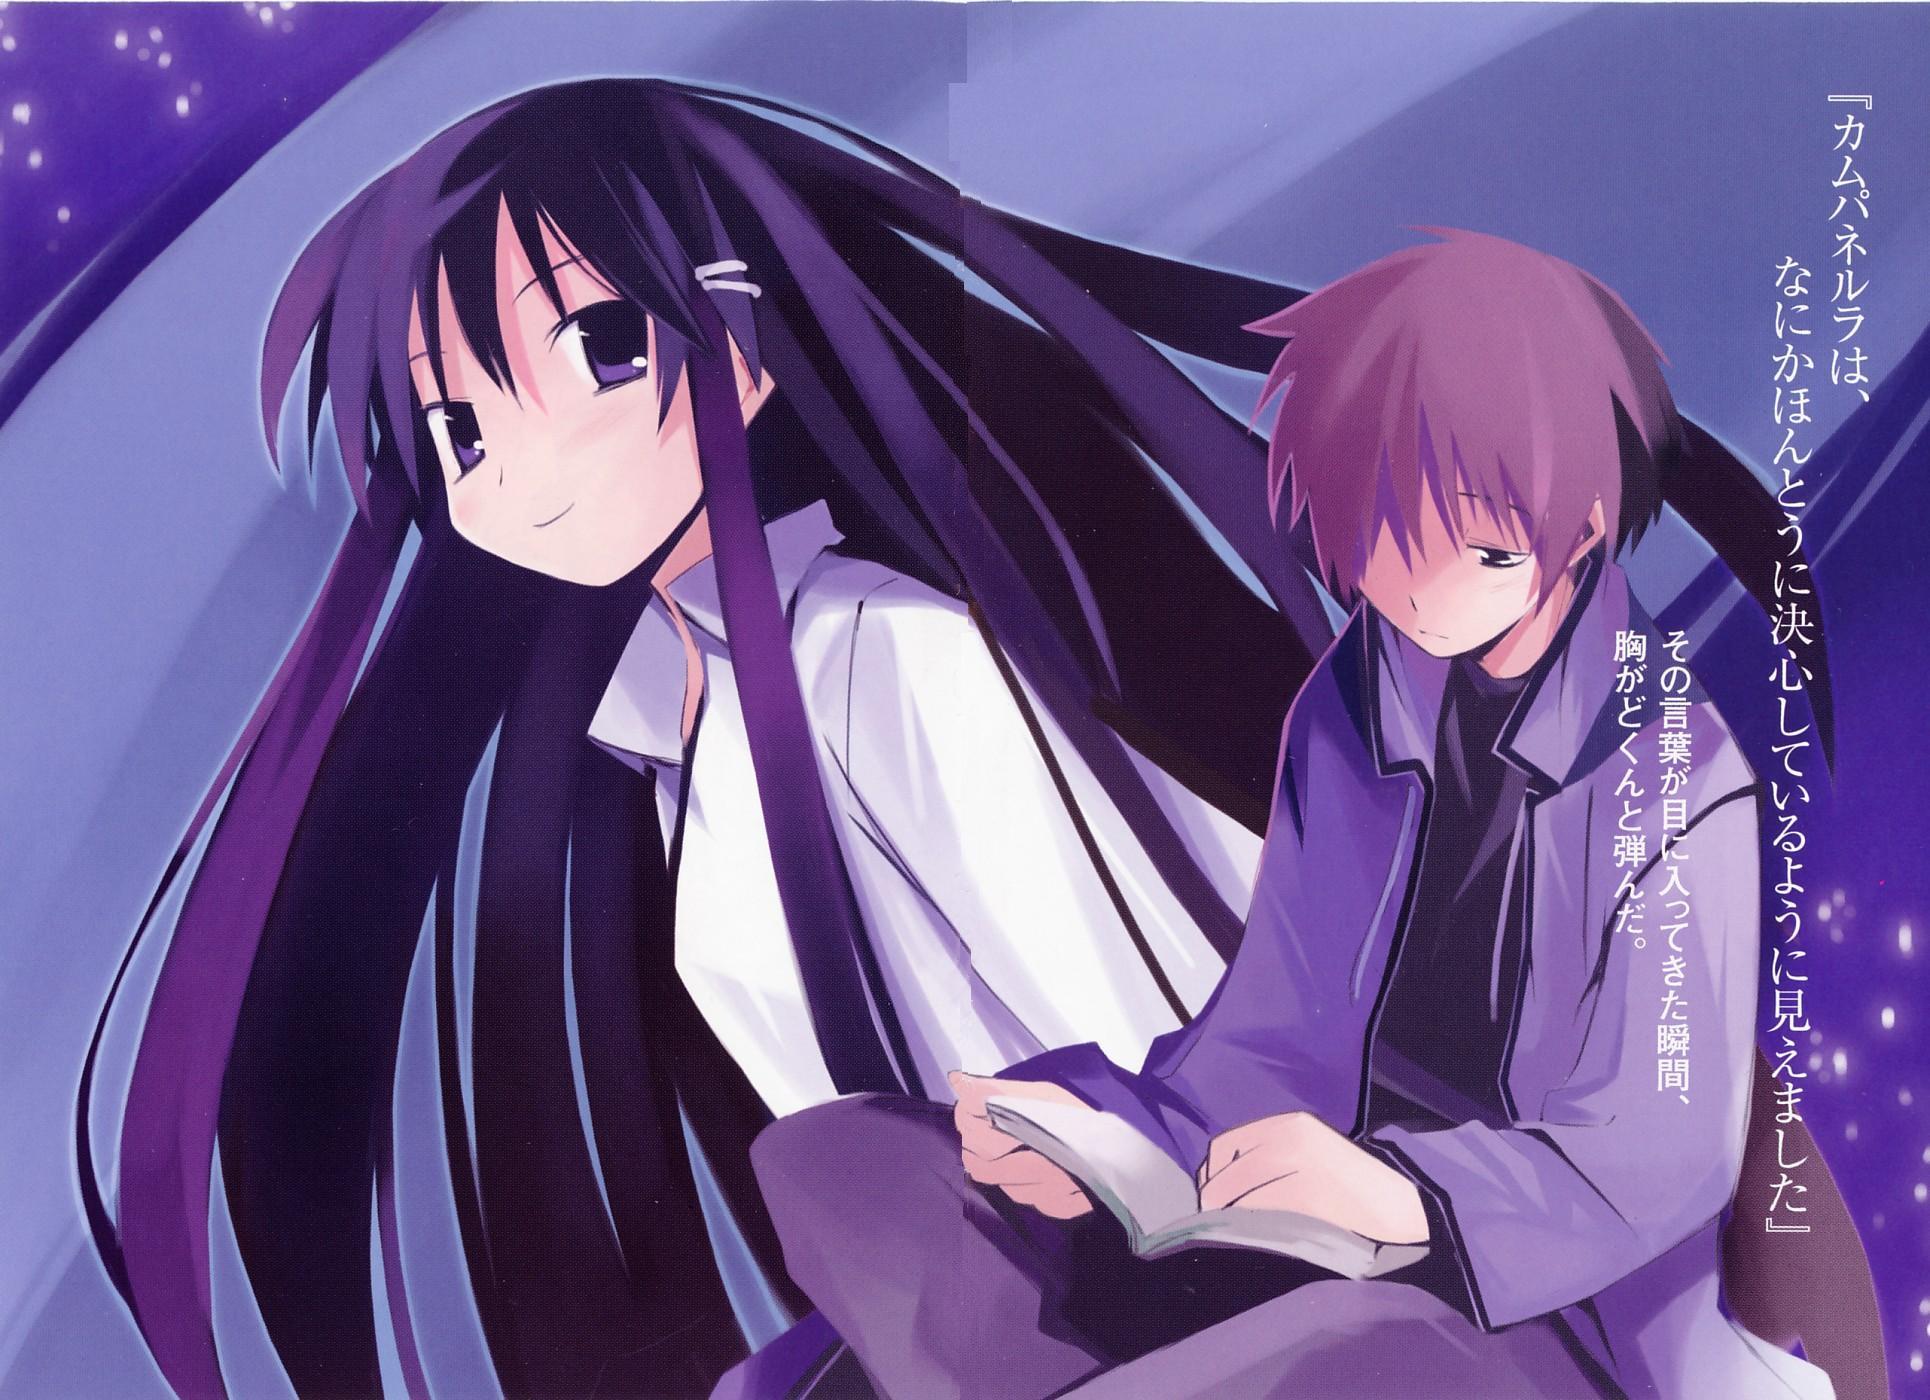 black_eyes book brown_hair hanbun_no_tsuki_ga_noboru_sora long_hair purple_eyes purple_hair scan short_hair yamamoto_keiji